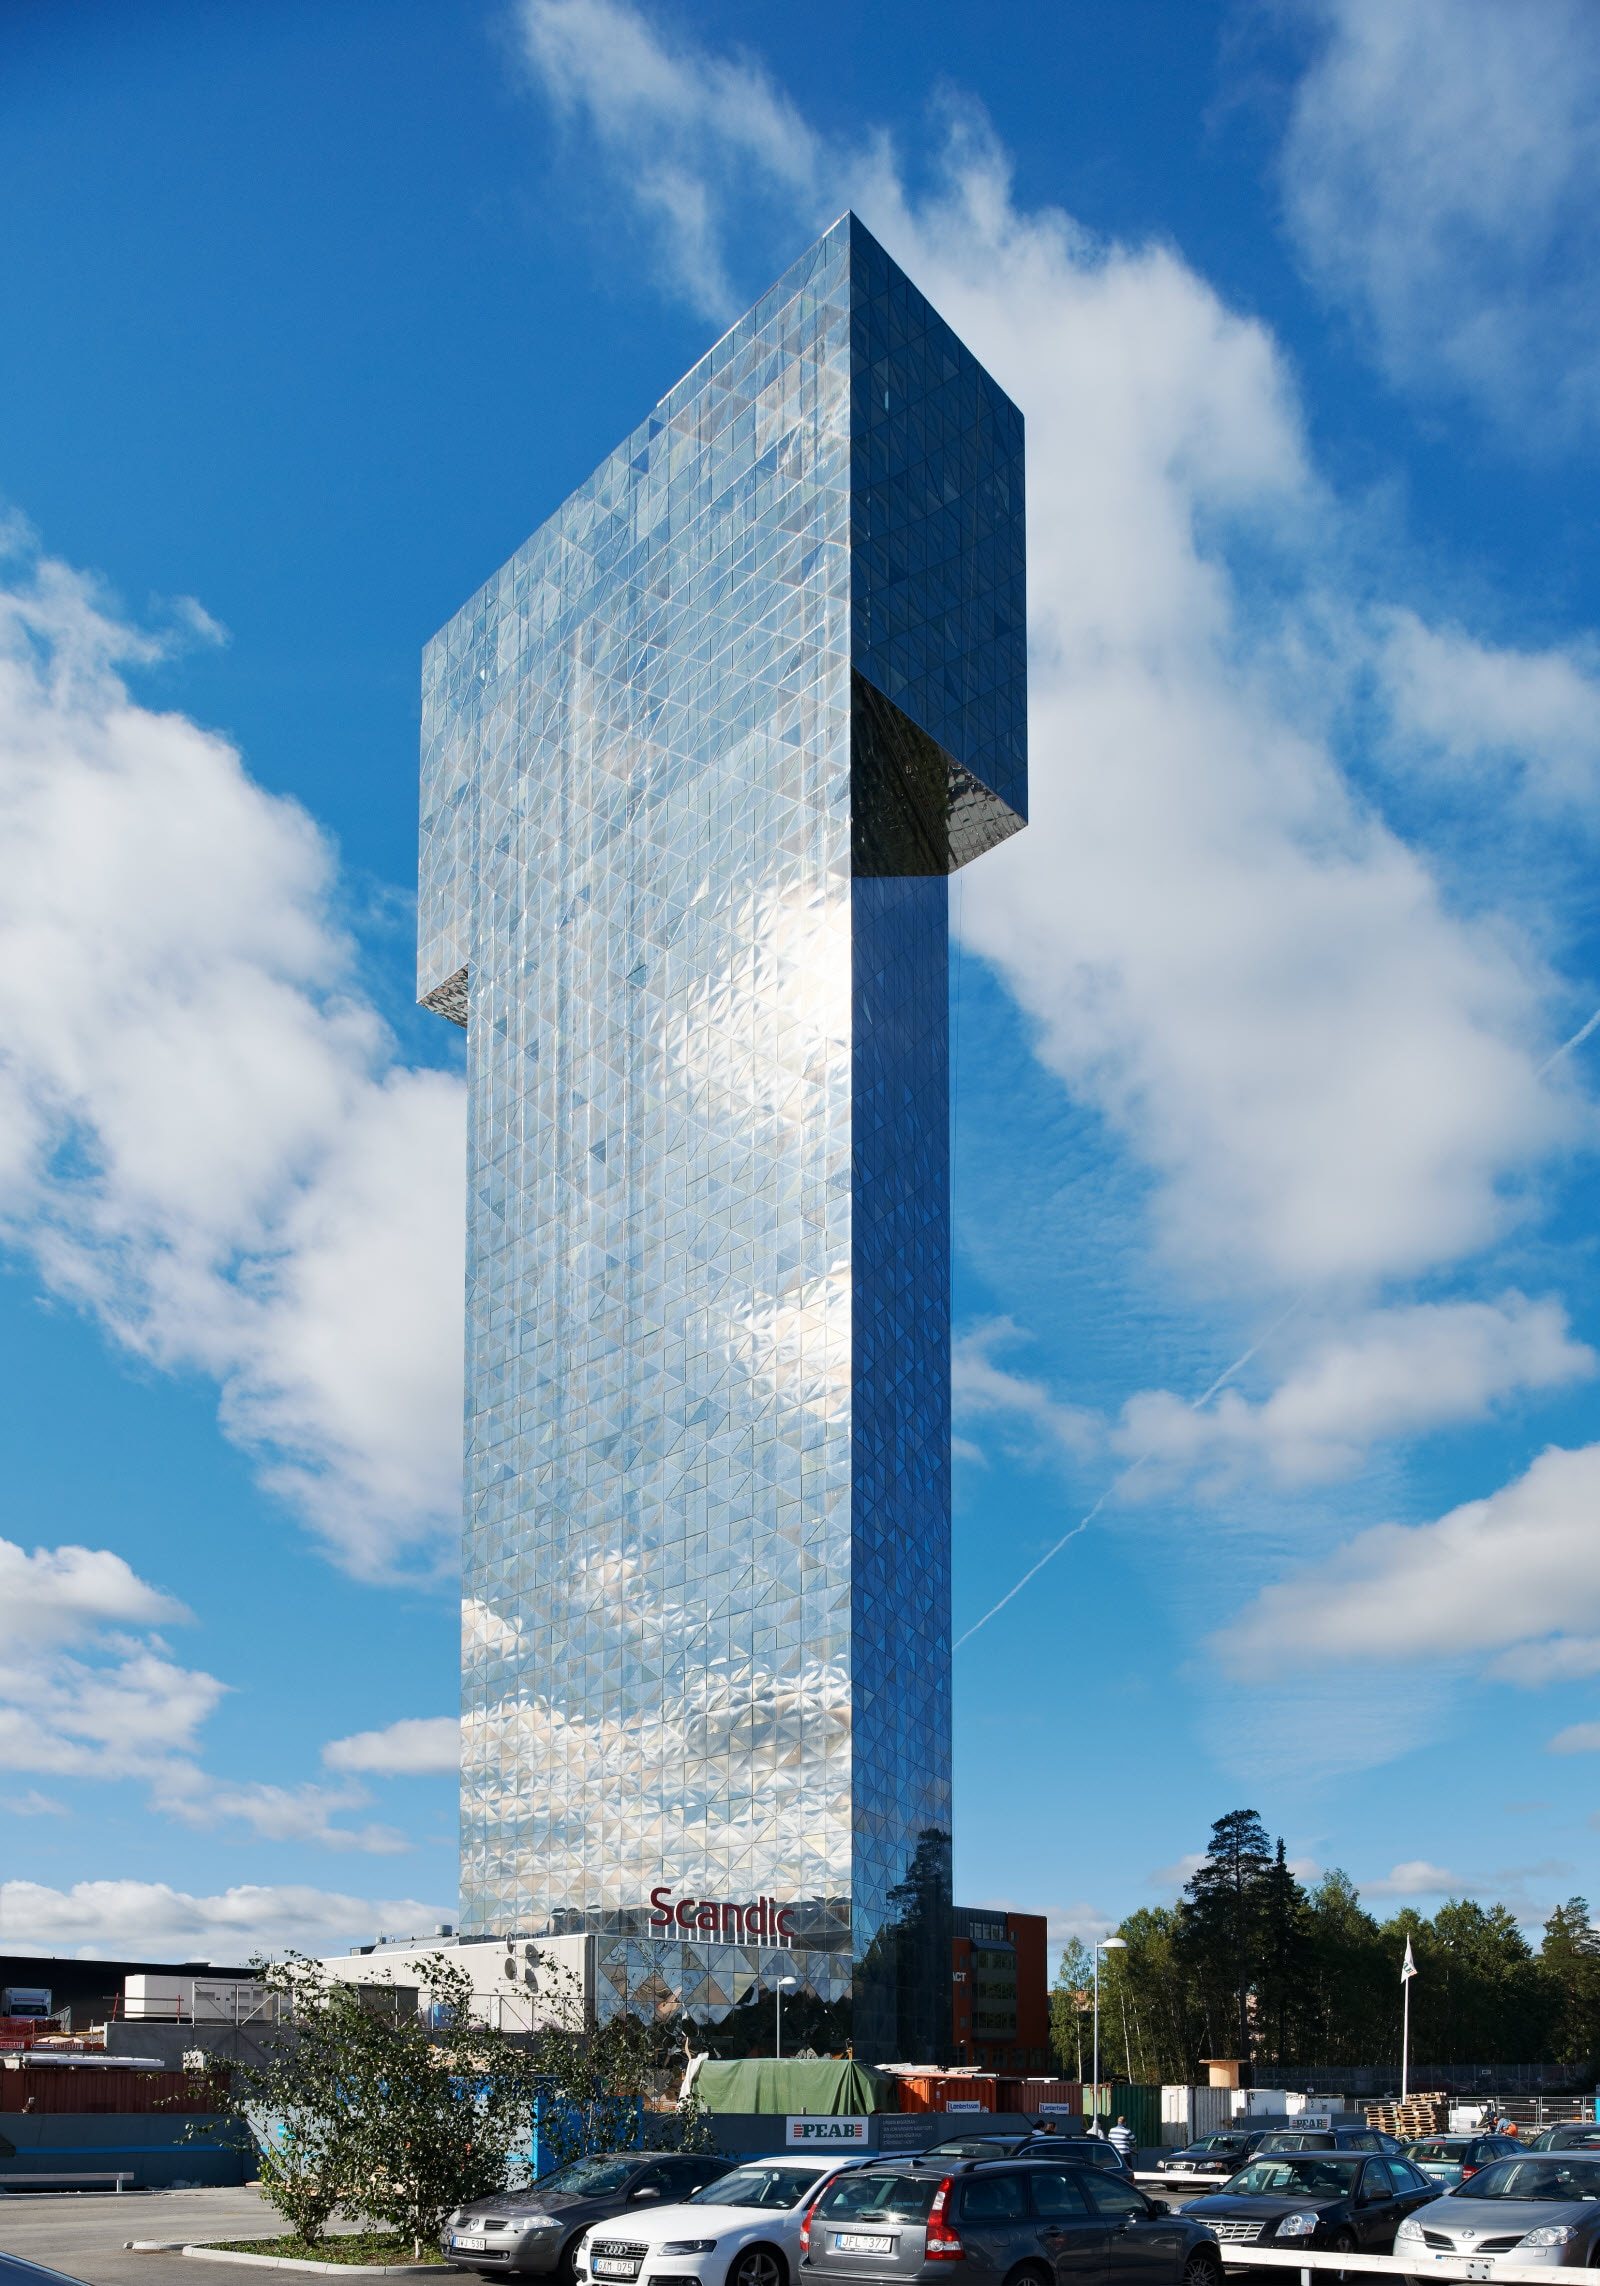 Scandic victoria tower hotel stockholm for Hotel stockholm